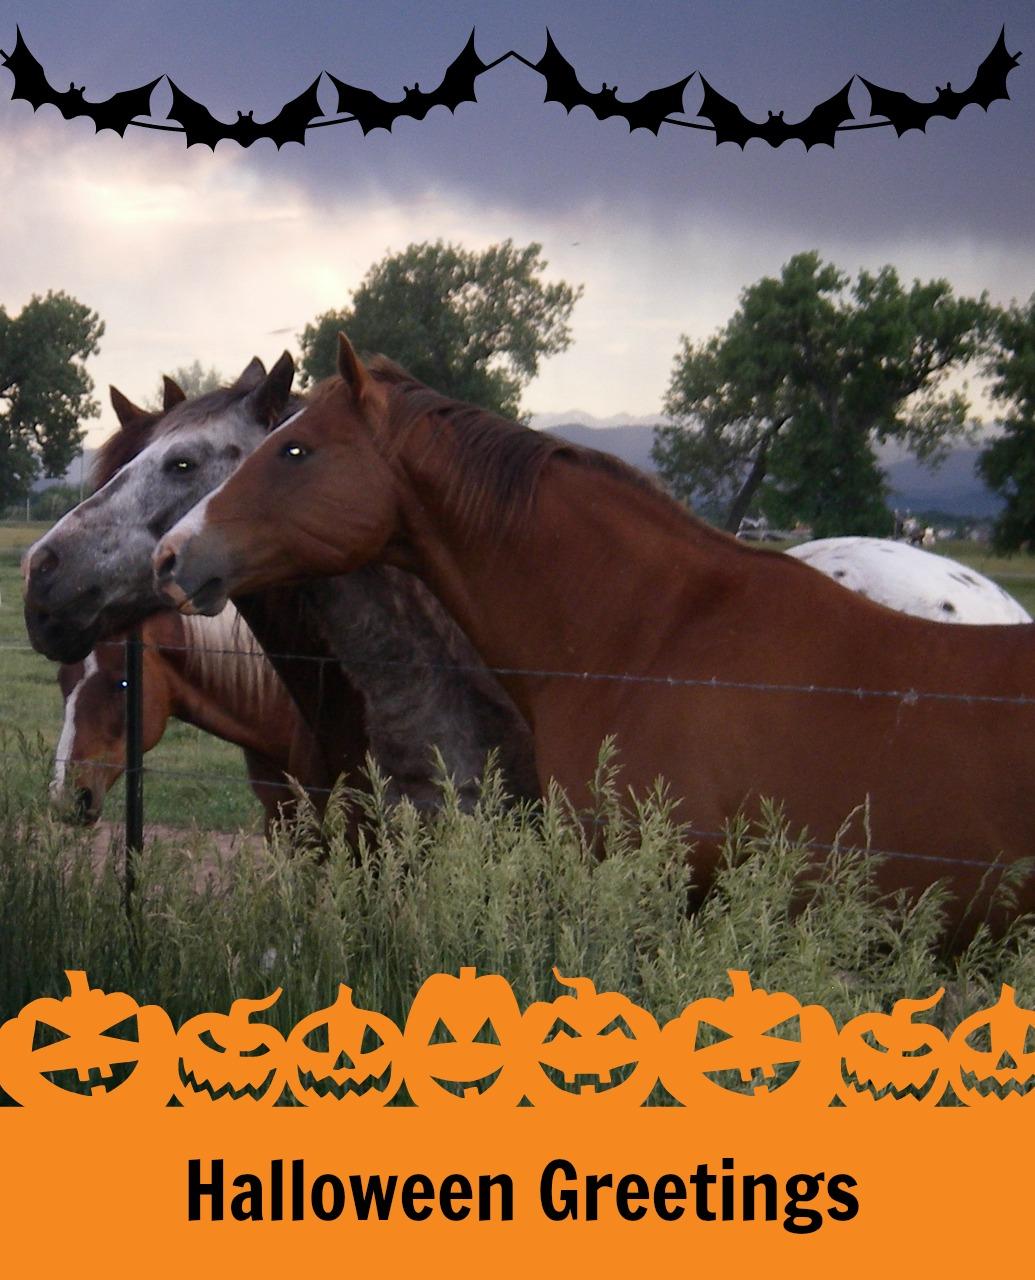 Halloween Happy horse pictures photos